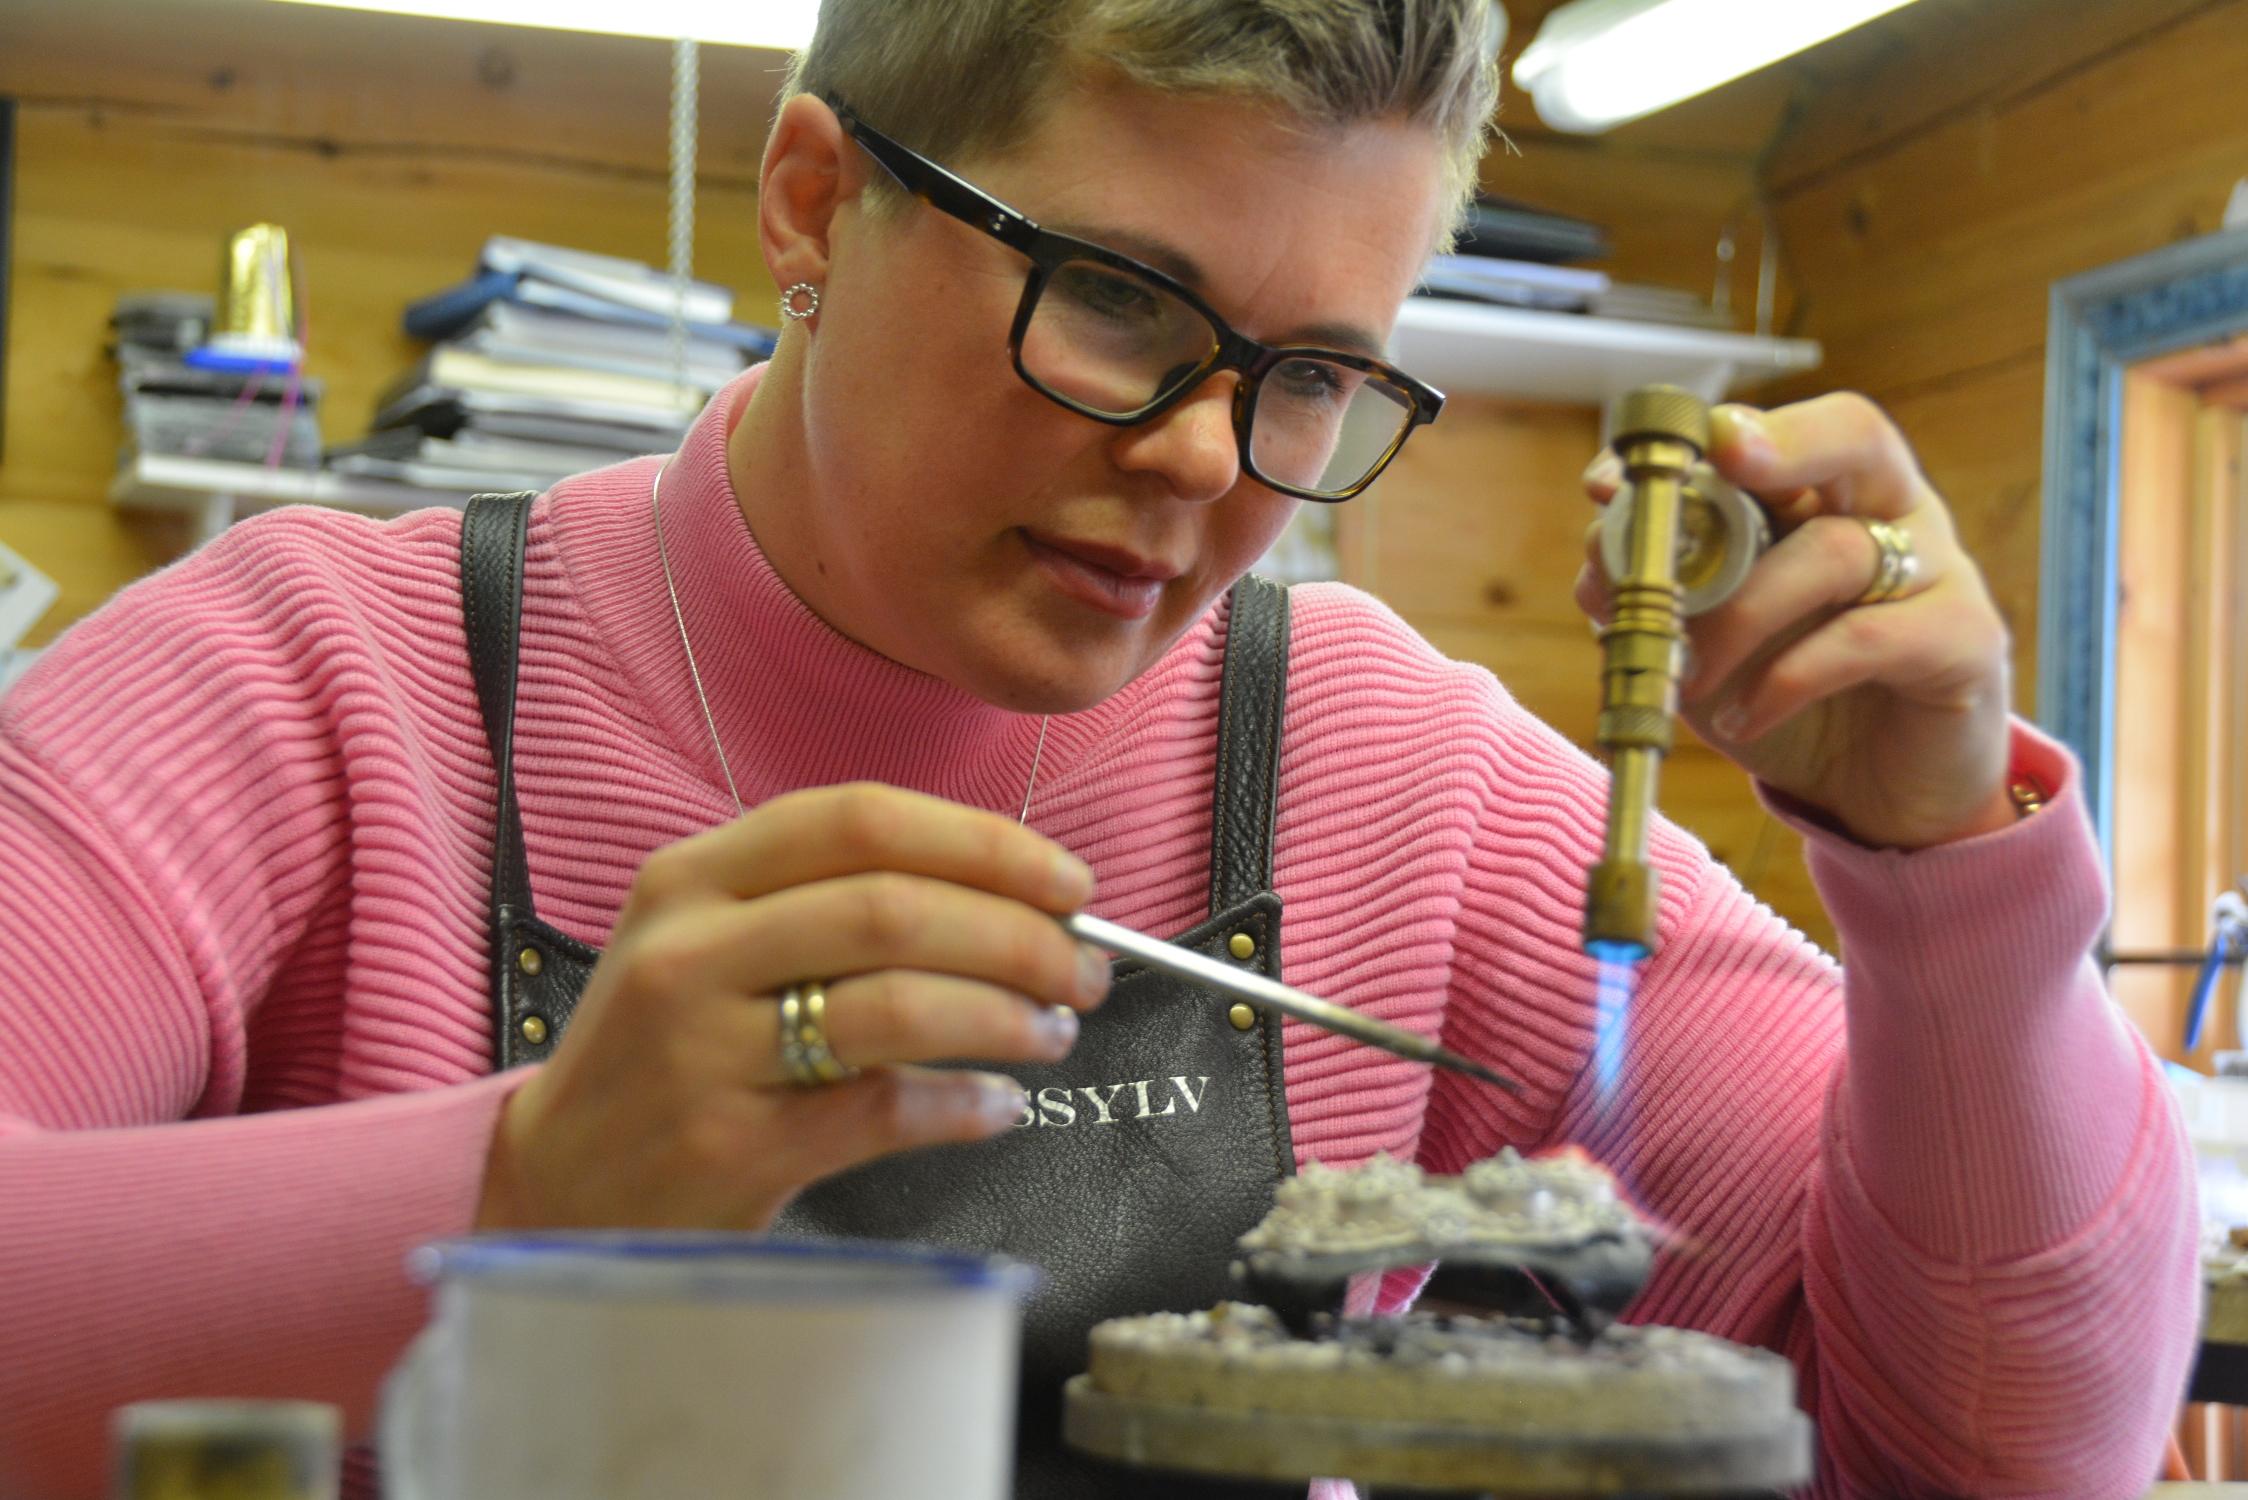 Ingrid Svalastog Kollberg, sylvsmed, filigransarbeidar, driv Telemarkssylv på Ravnejuvvegen i Tokke kommune. Foto: Tone Tveit